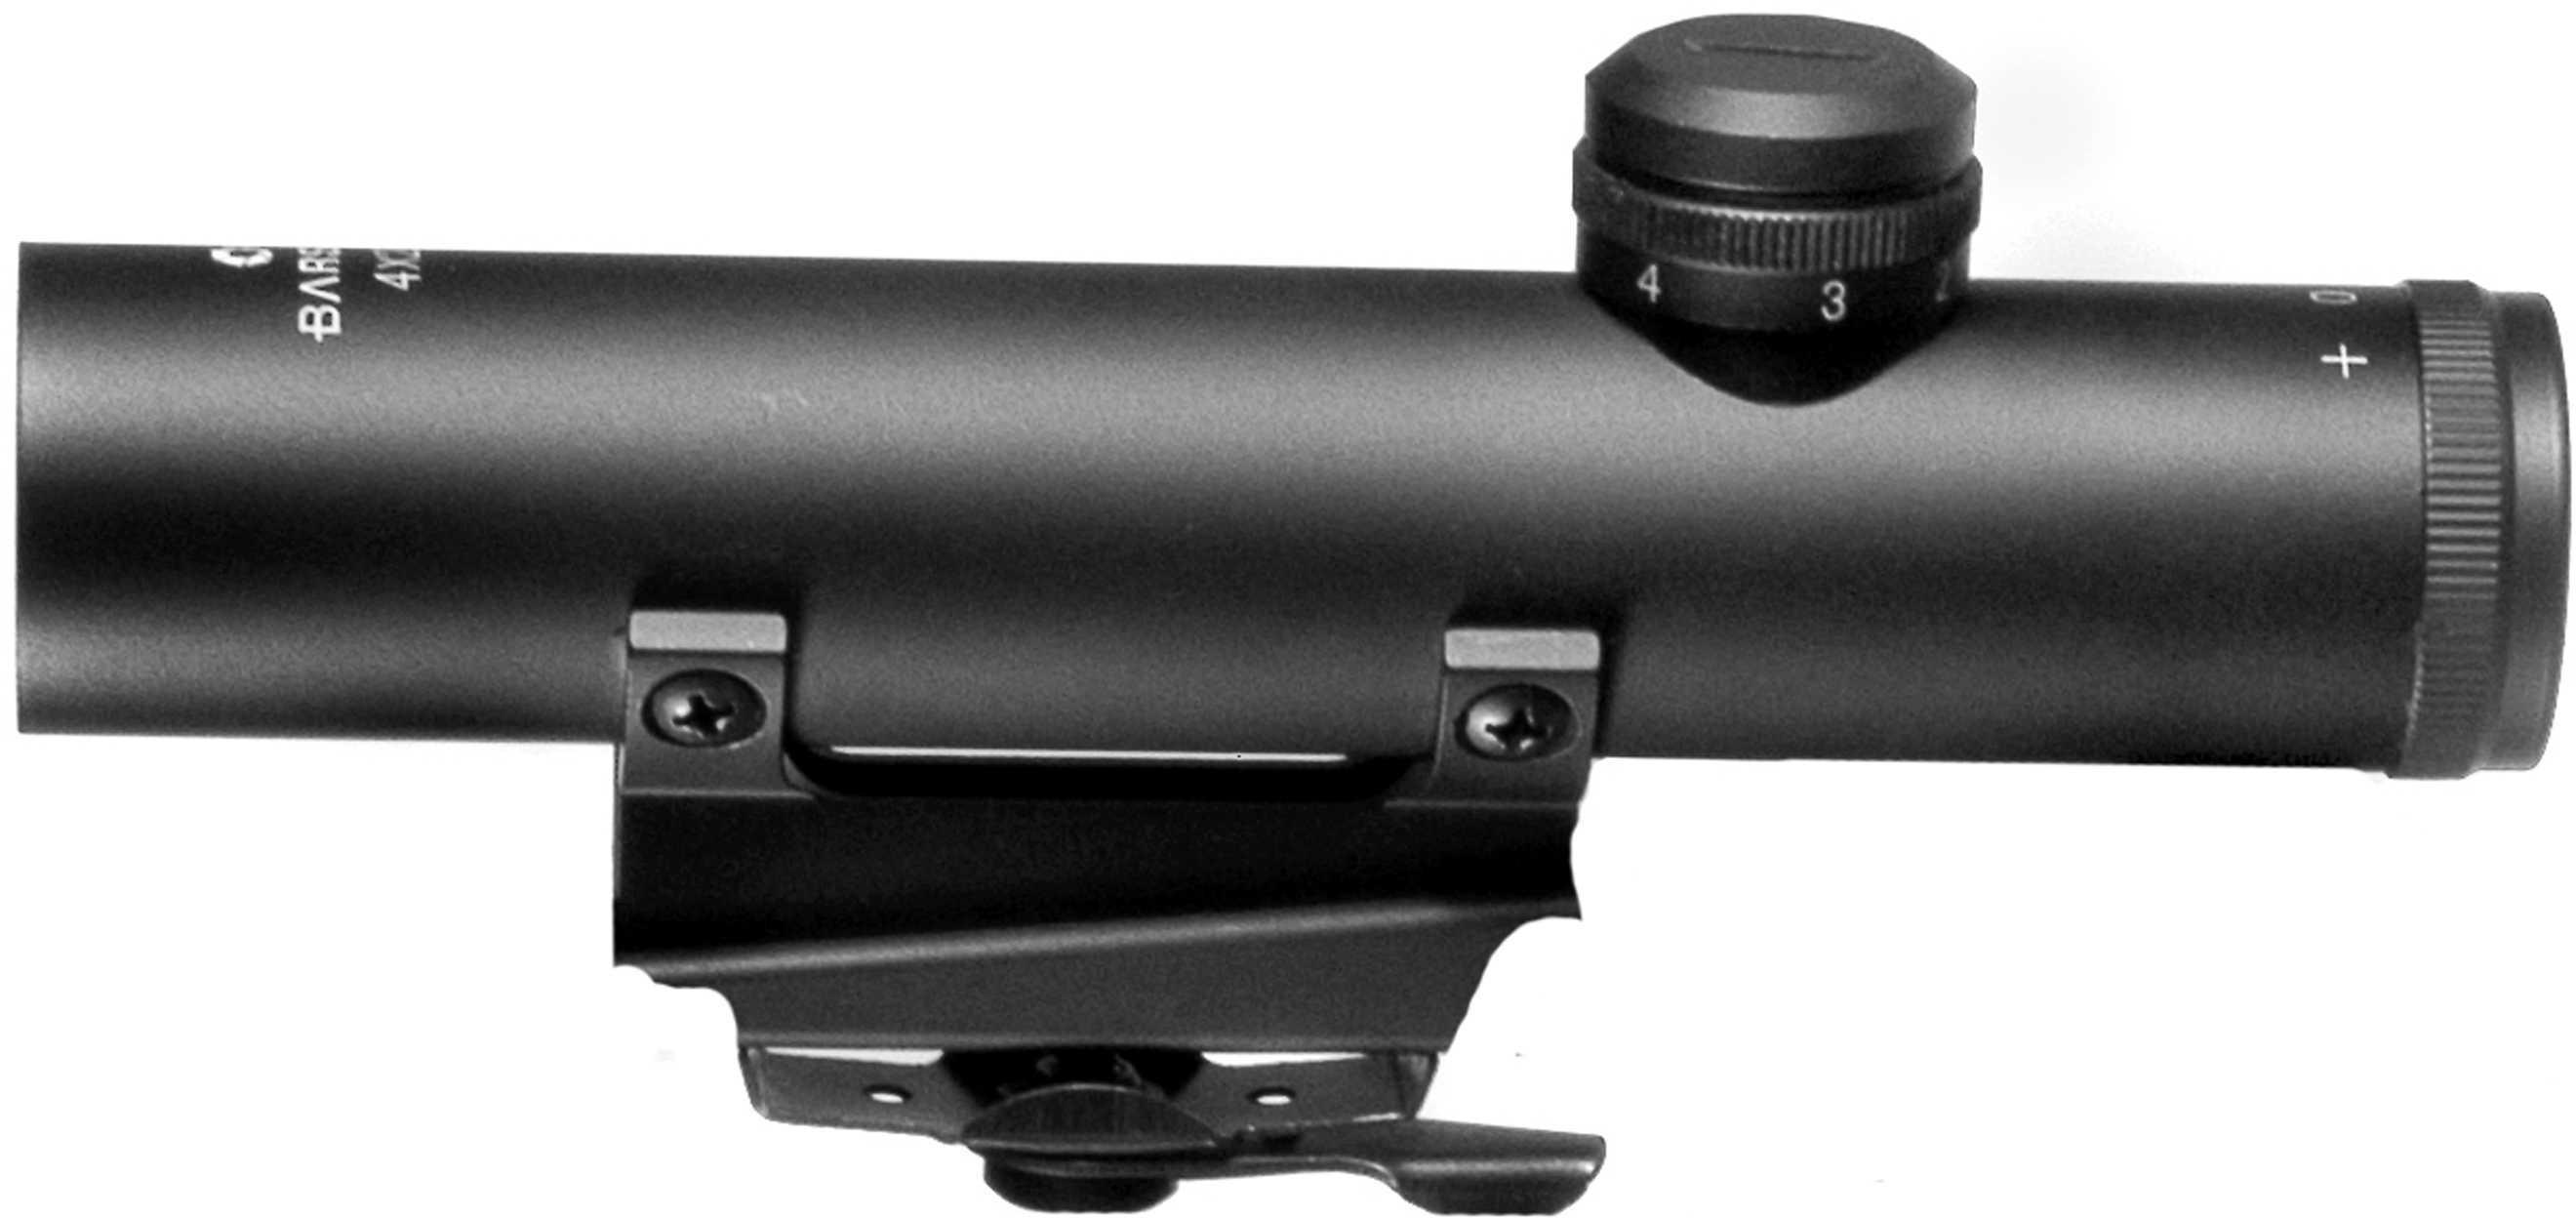 Barska Optics 4X20 M16 Carry Handle Scope BDC Reticle AC10838